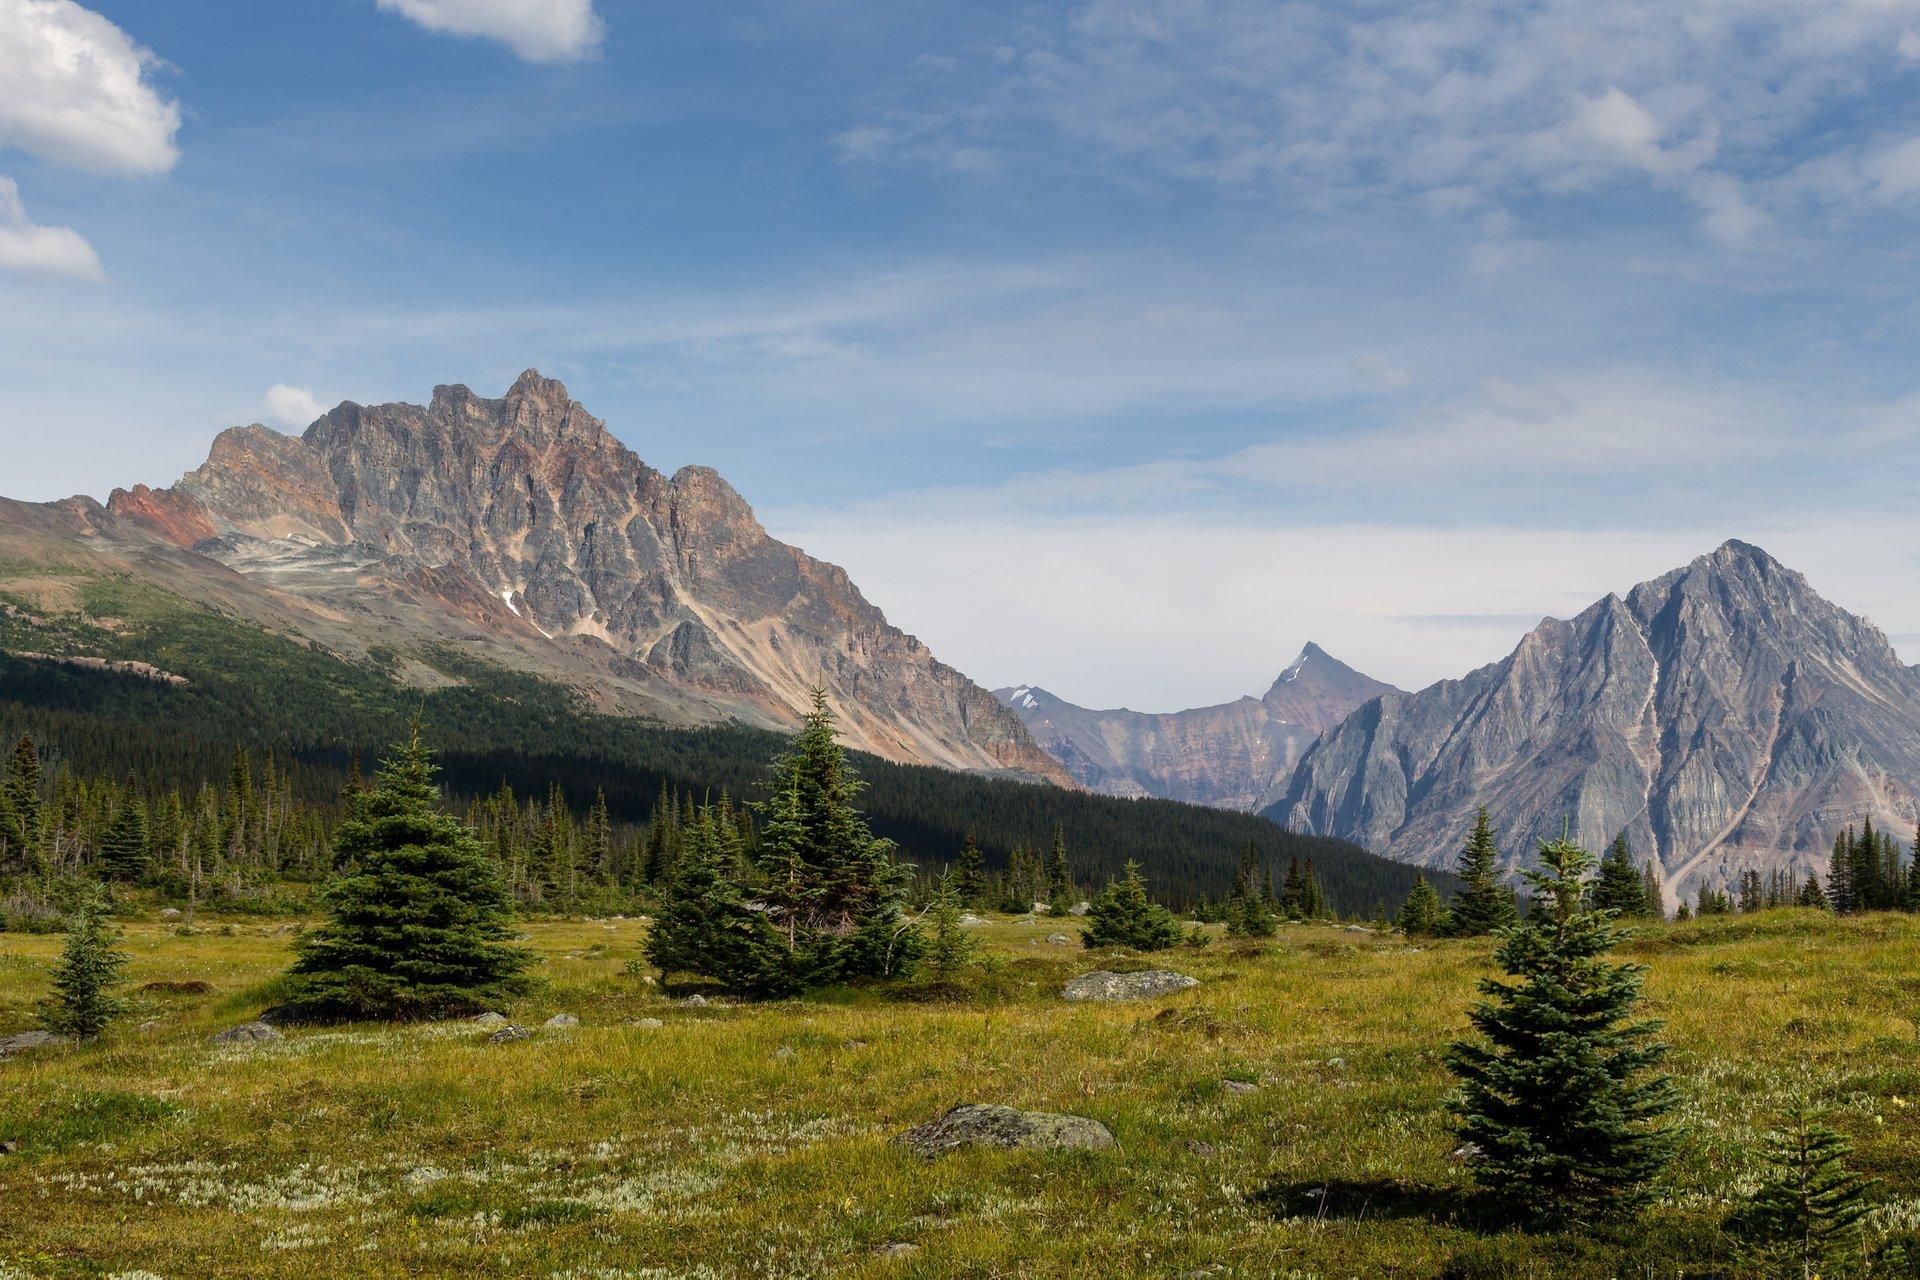 Tonquin Valley Hike in Banff & Jasper National Parks 2020 - Best Time